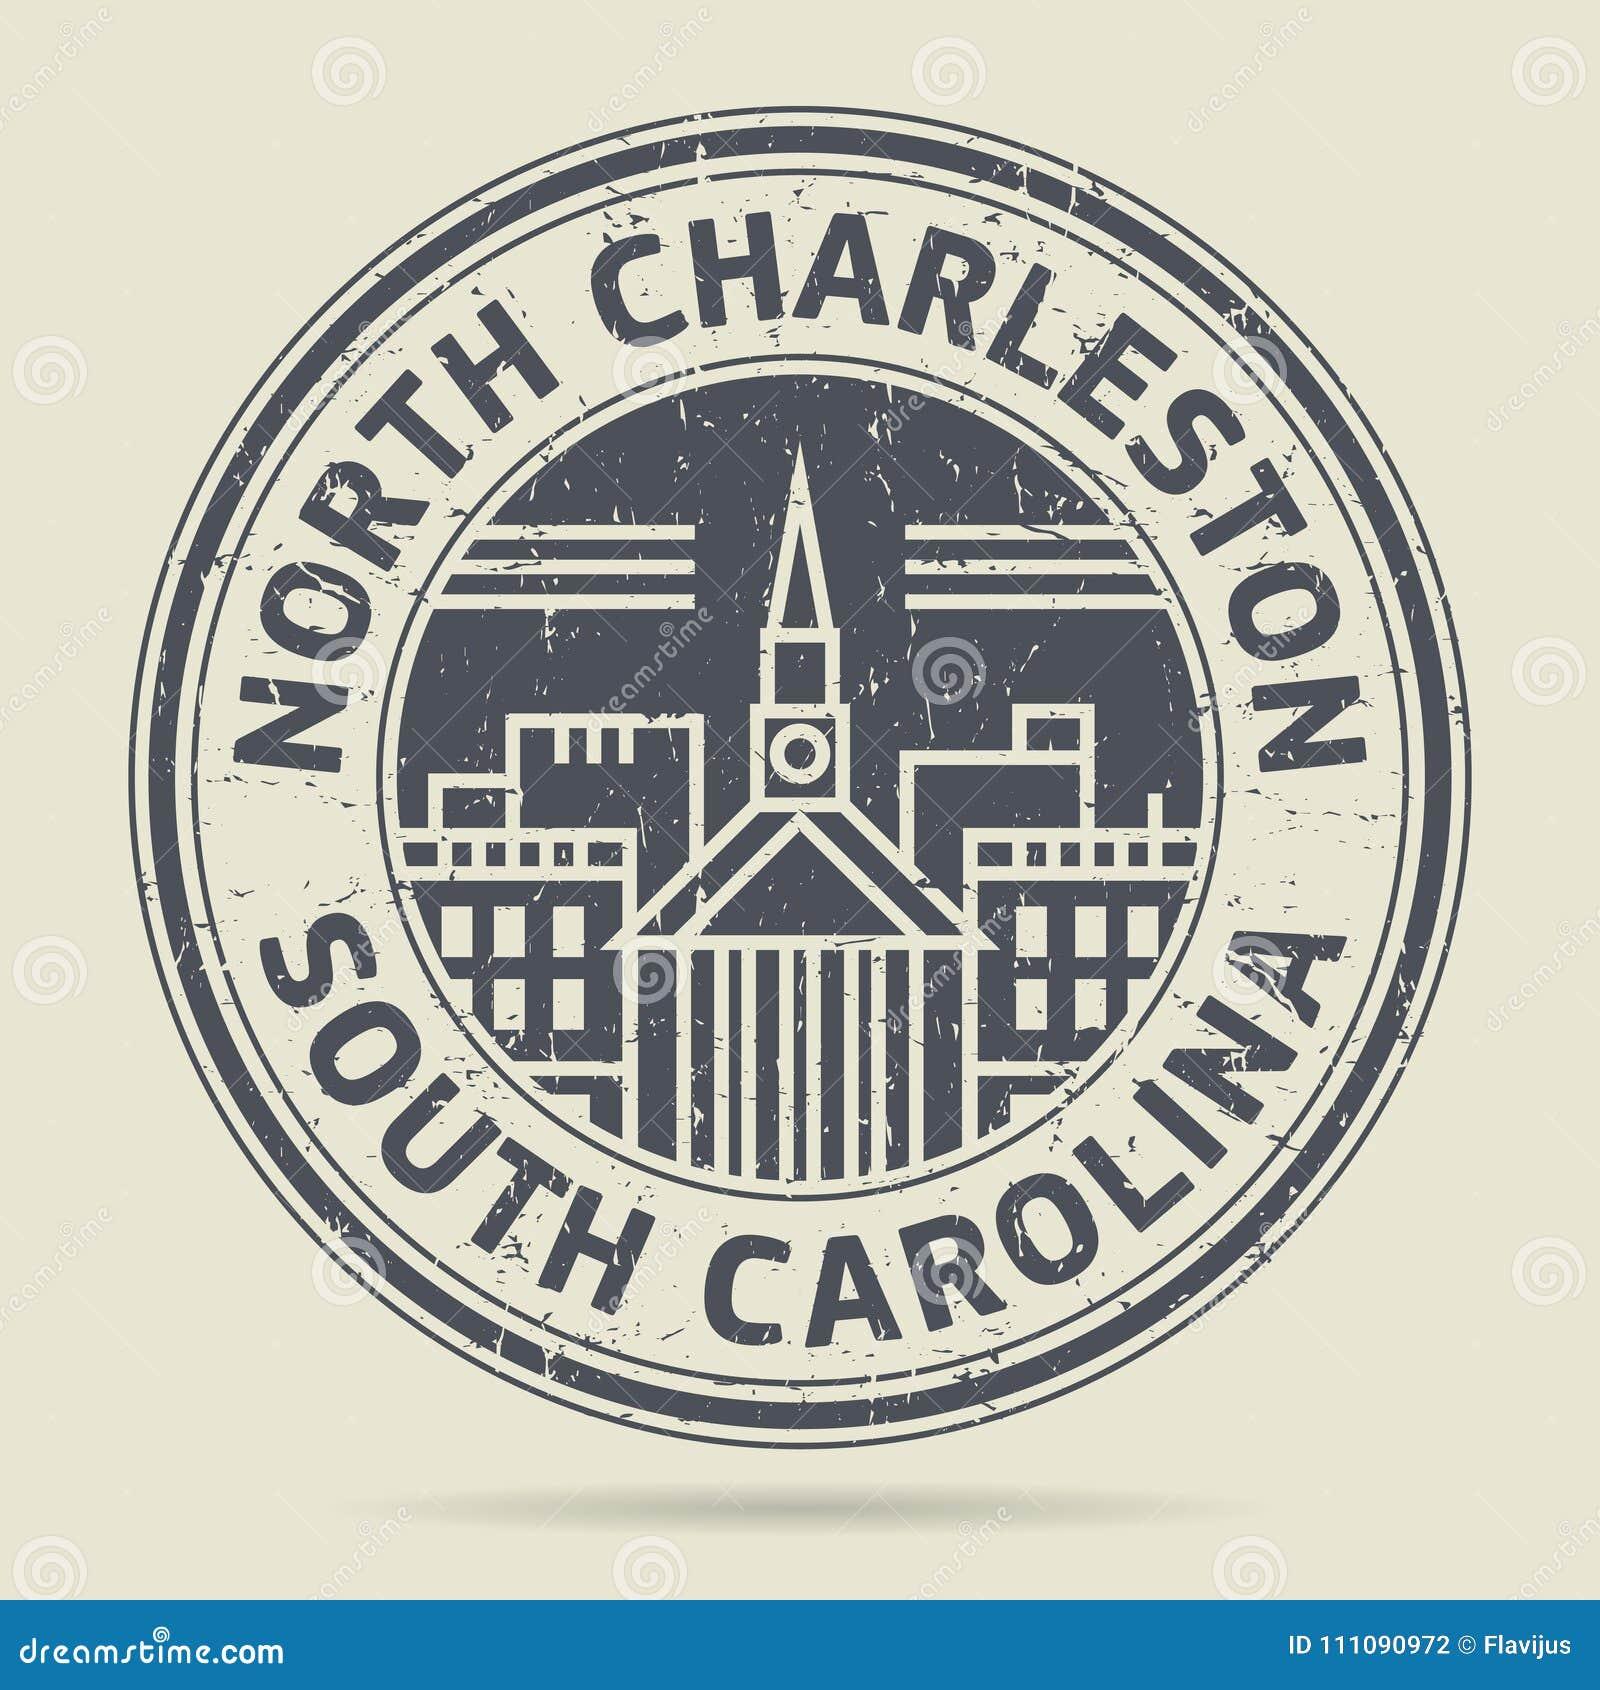 Carimbo de borracha ou etiqueta do Grunge com texto Charleston norte, C sul